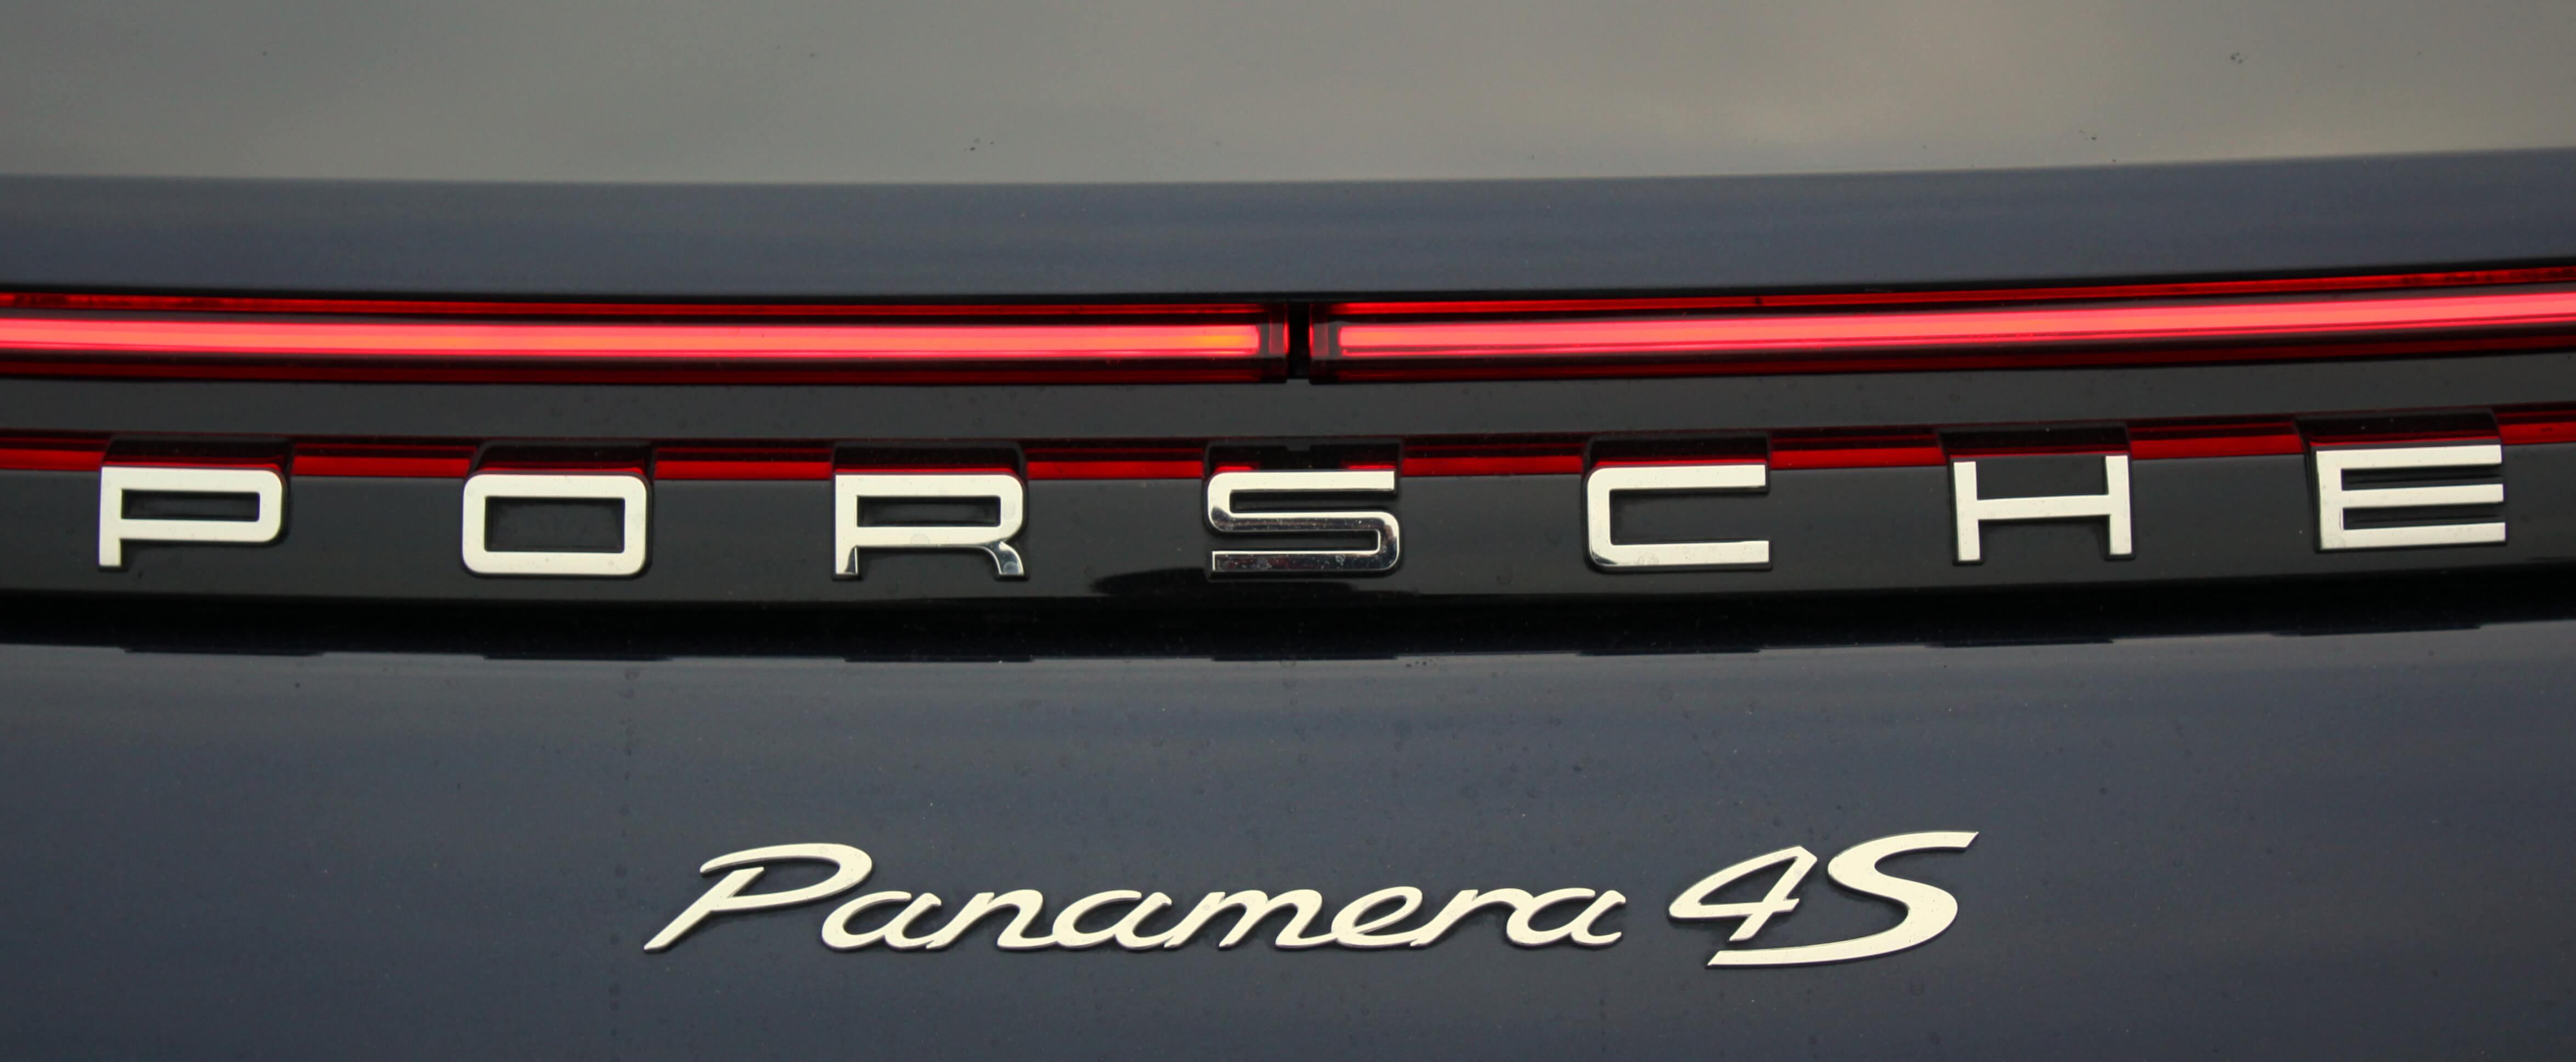 Test: Porsche Panamera 4S Diesel – To tons tysk lækkerhed